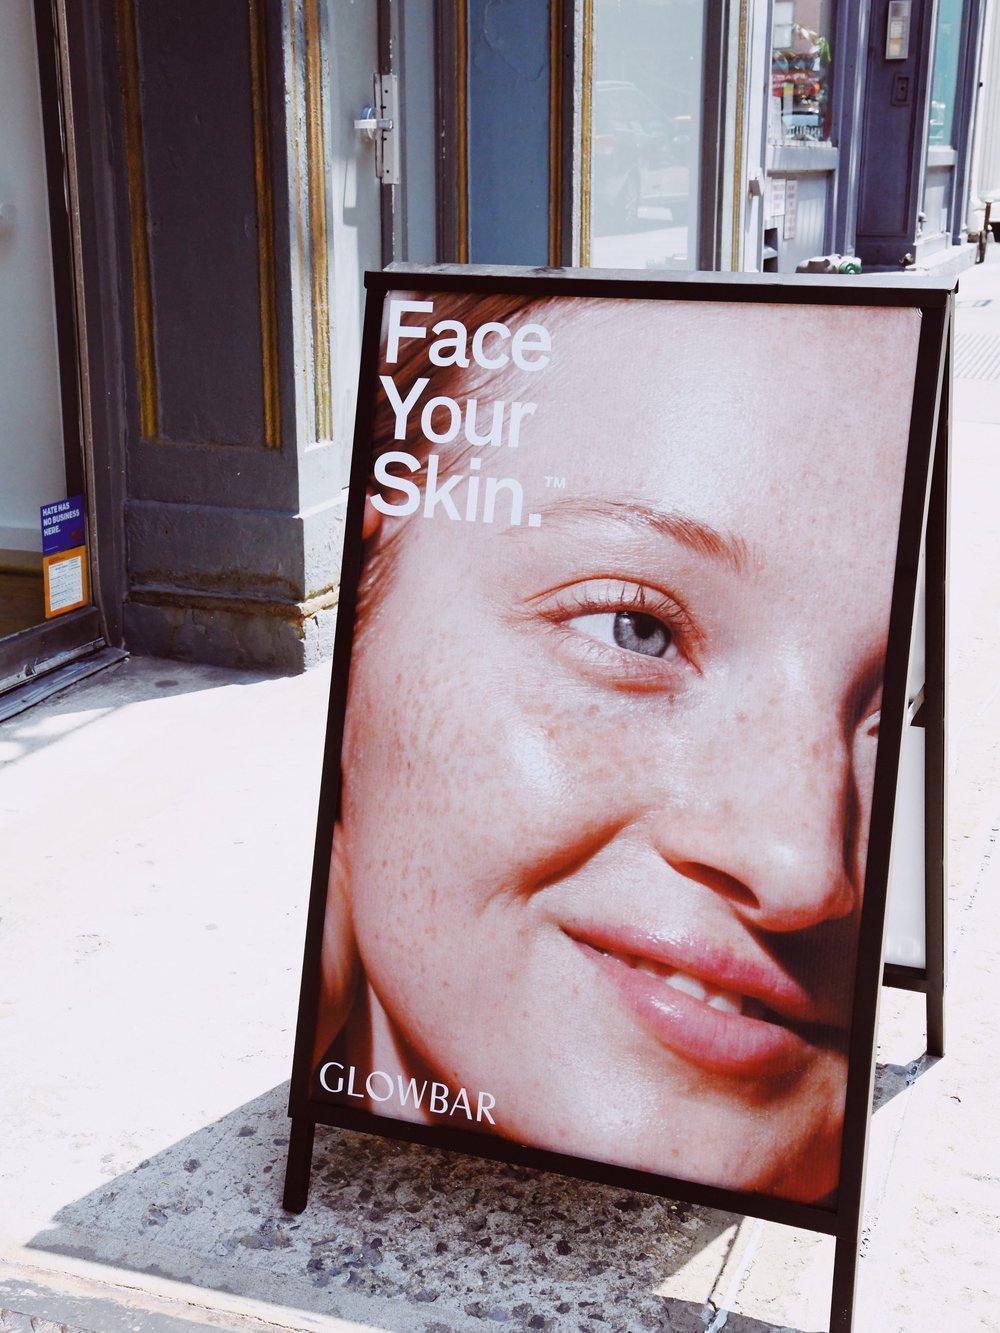 Glowbar+face+your+skin+rachel+liverman.jpg